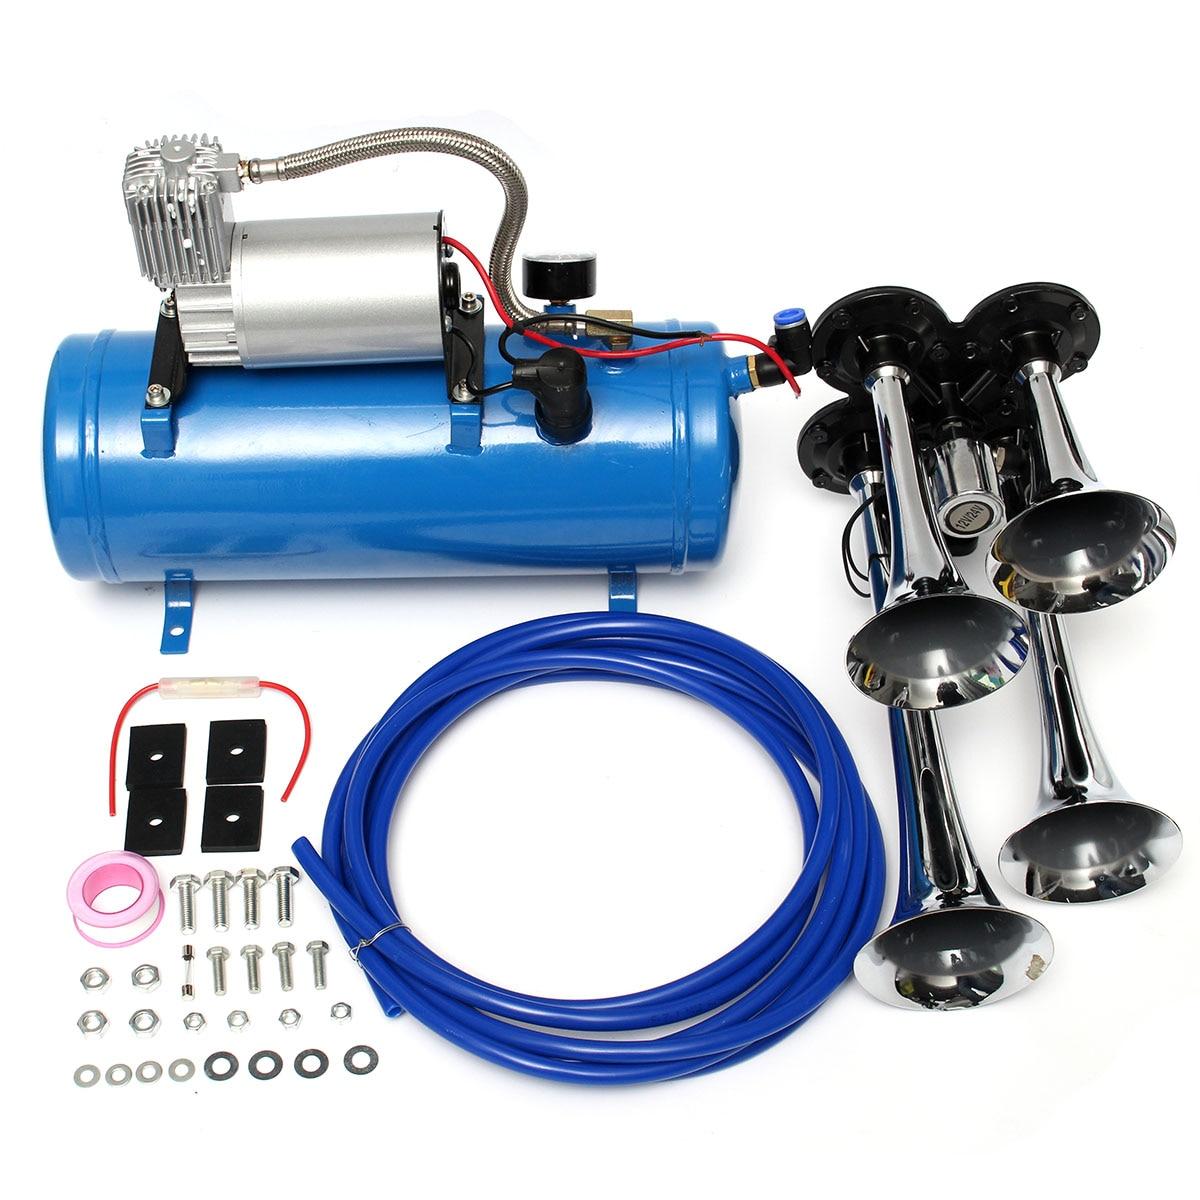 4 tromba Veicolo Tromba D'aria 12 v Compressore Tubi 150 dB Treno 120 PSI Kit 6L